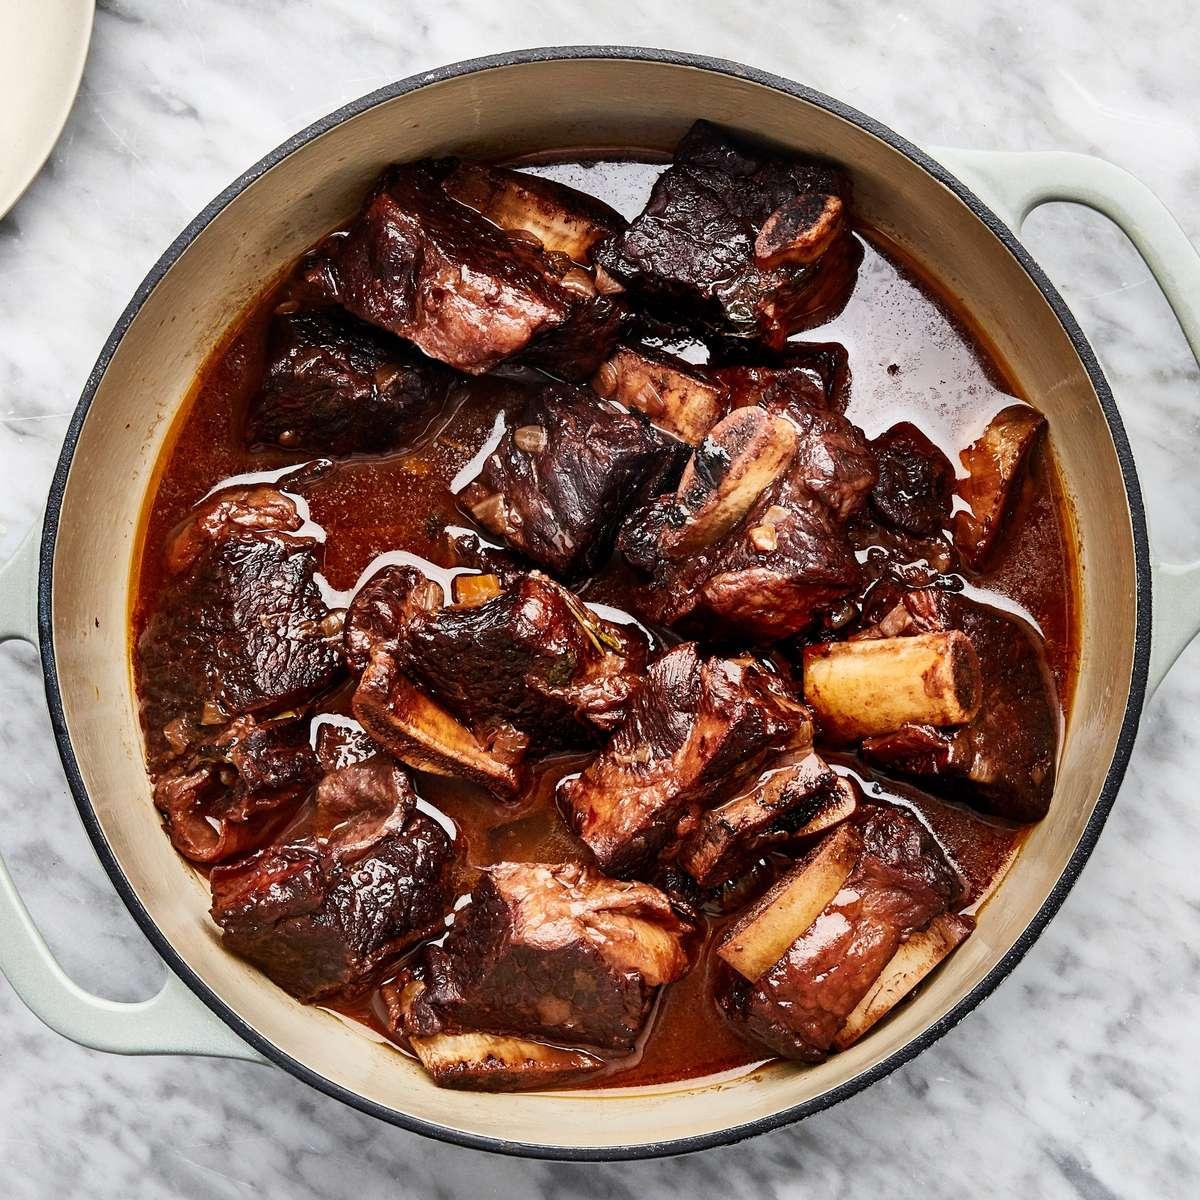 Braised Short Rib of Beef Dinner for Four